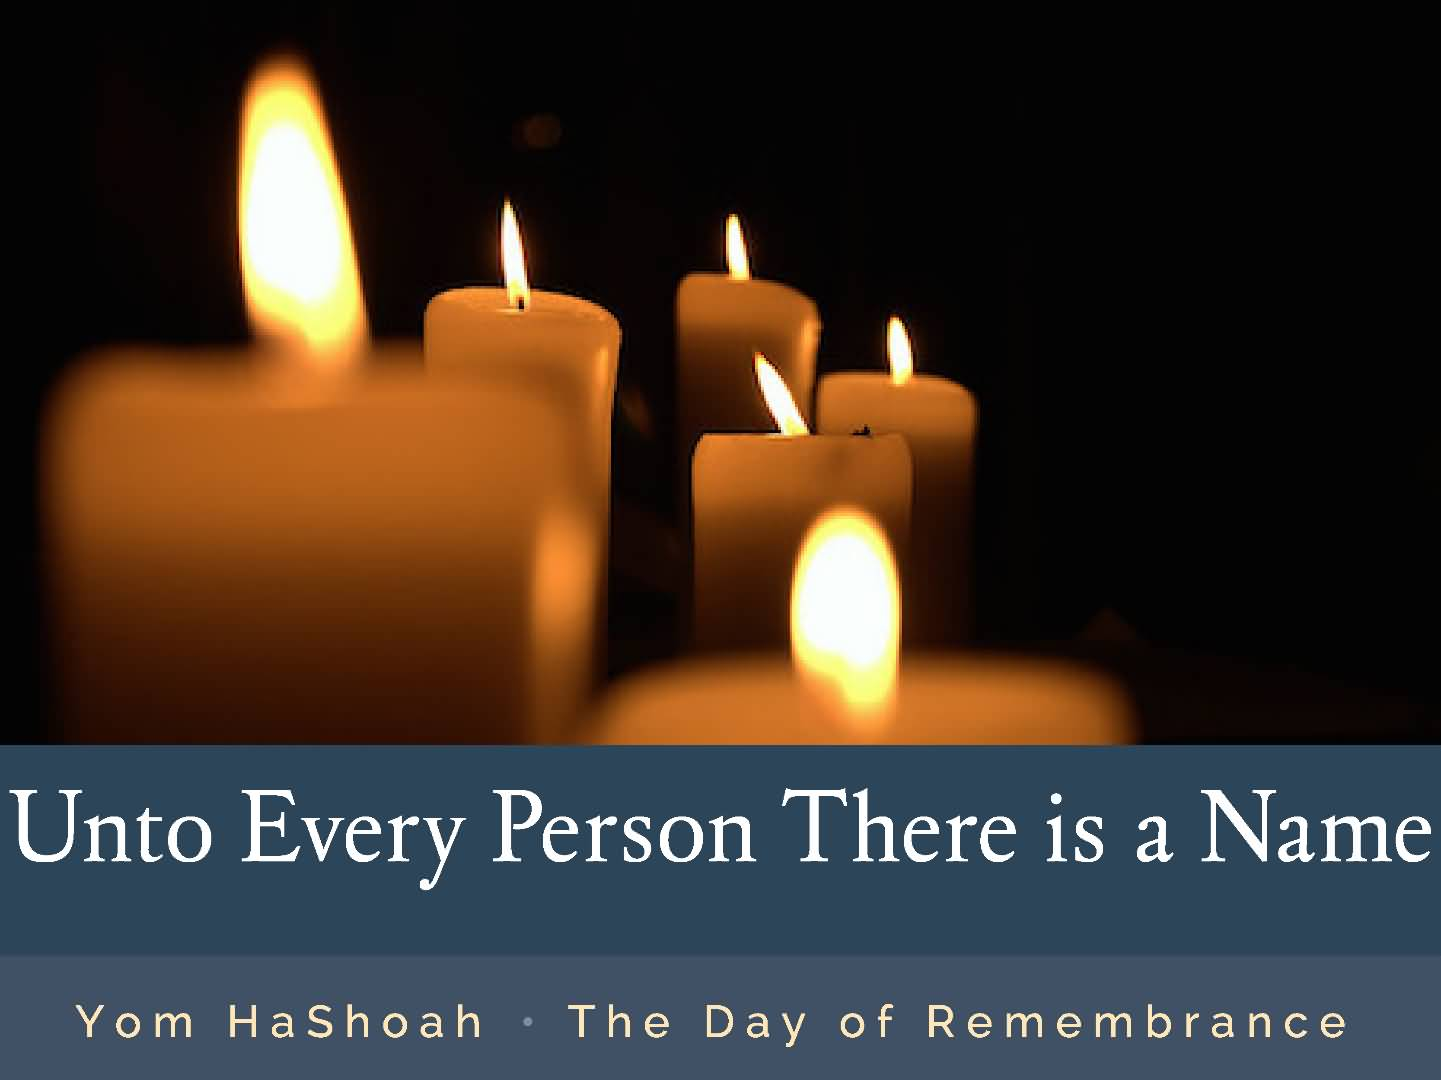 yom hashoah holocaust remembrance day